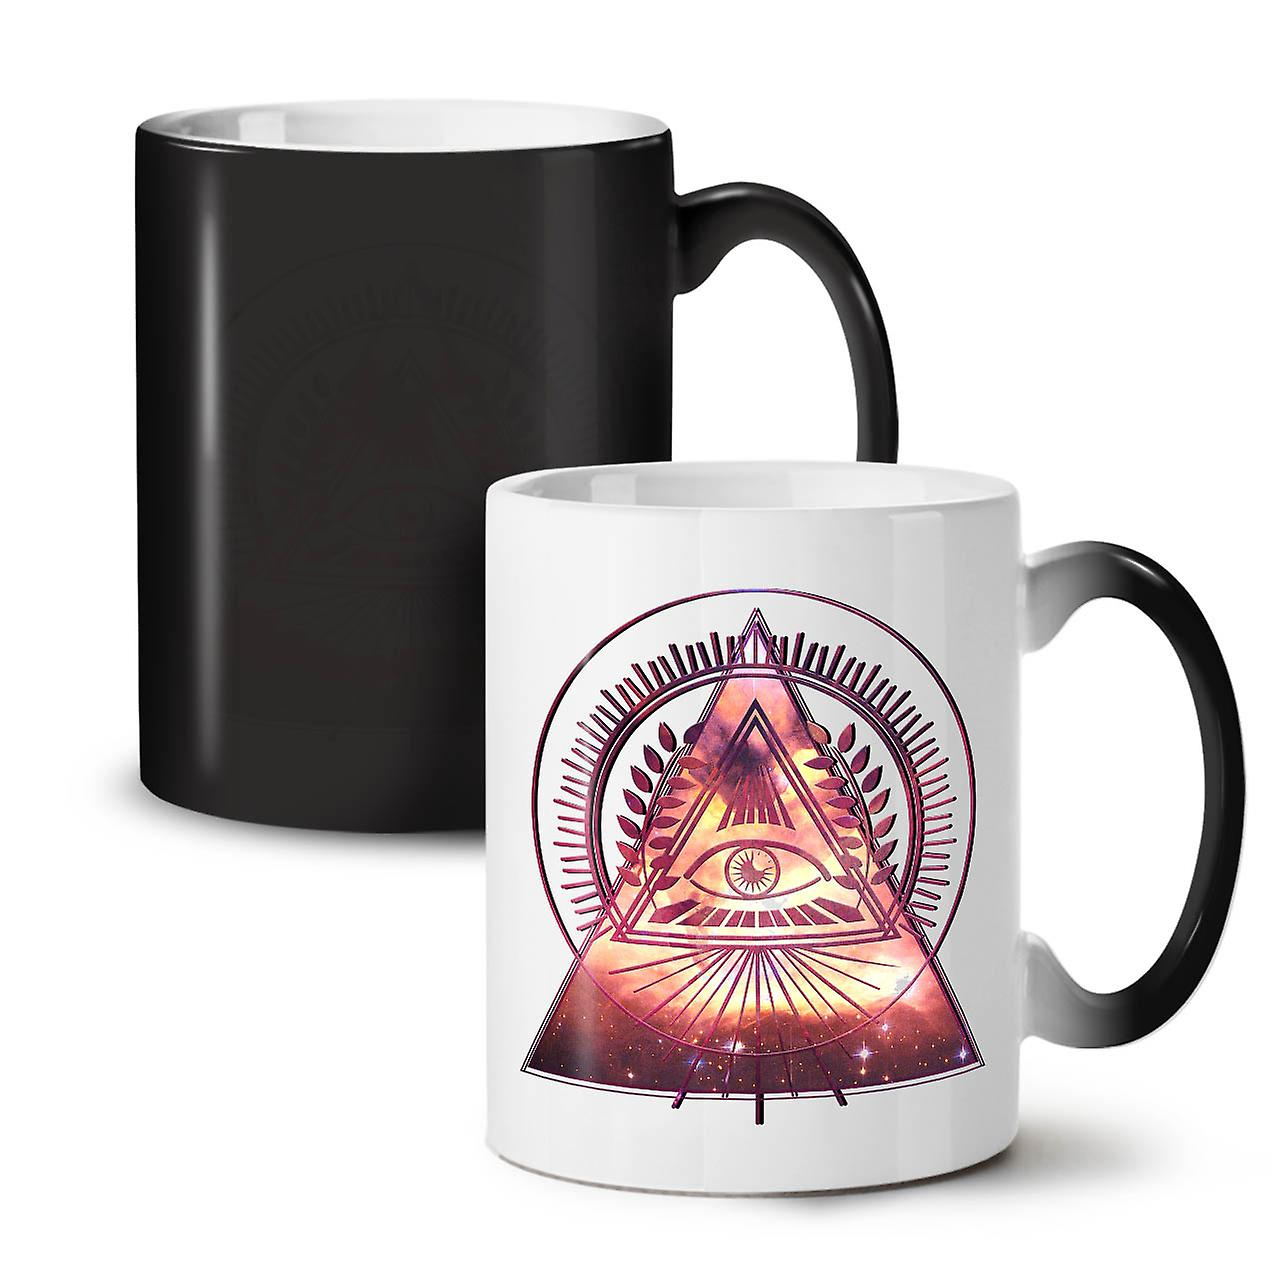 OzWellcoda Galaxy Tea Coffee Changing 11 New Triangle Ceramic Colour Mug Black kPiZuOX